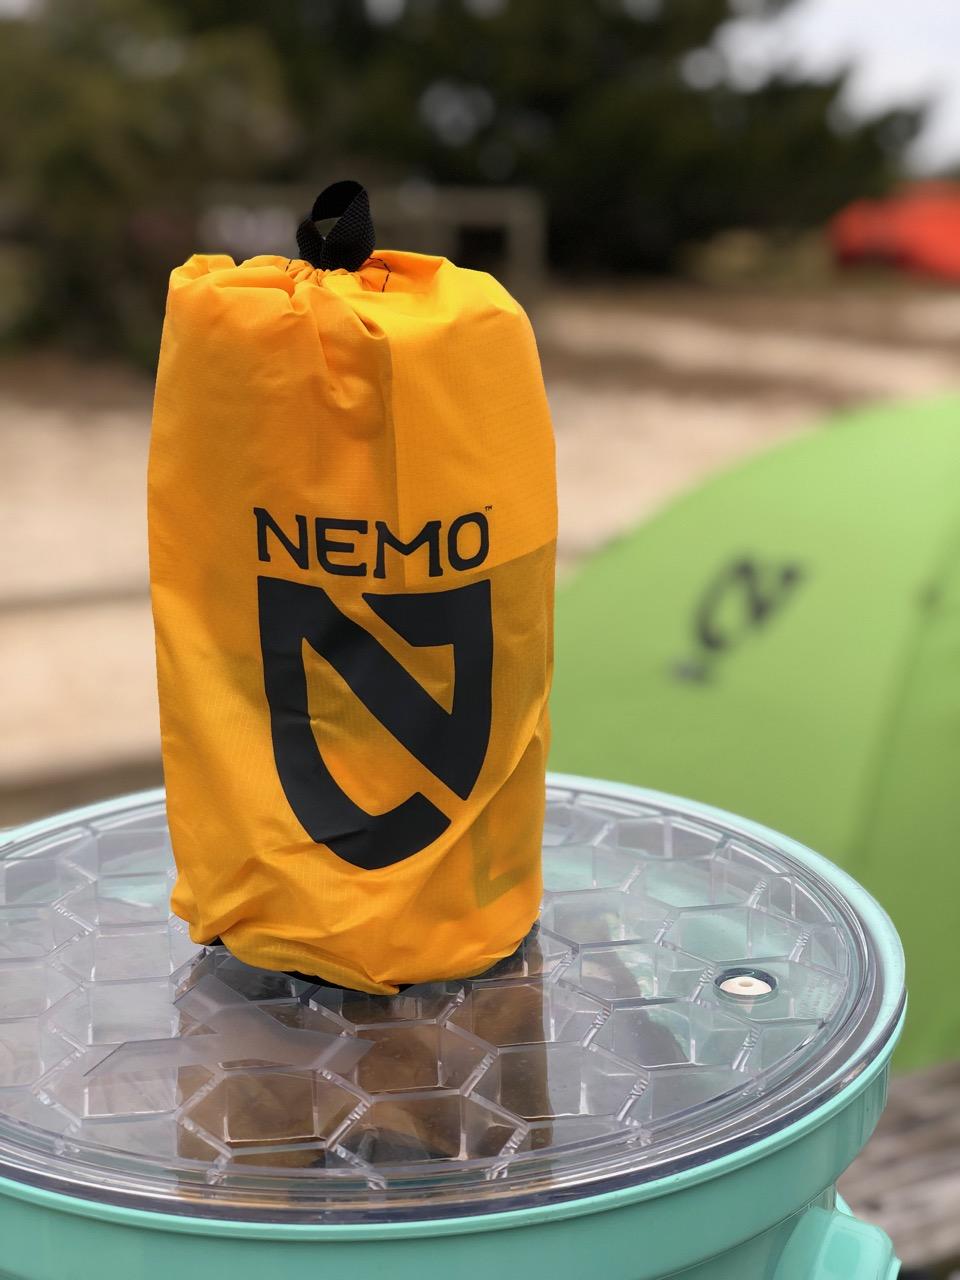 NEMO Tensor Regular Insulated Ultralight Sleeping Pad (2019) in Storage Bag